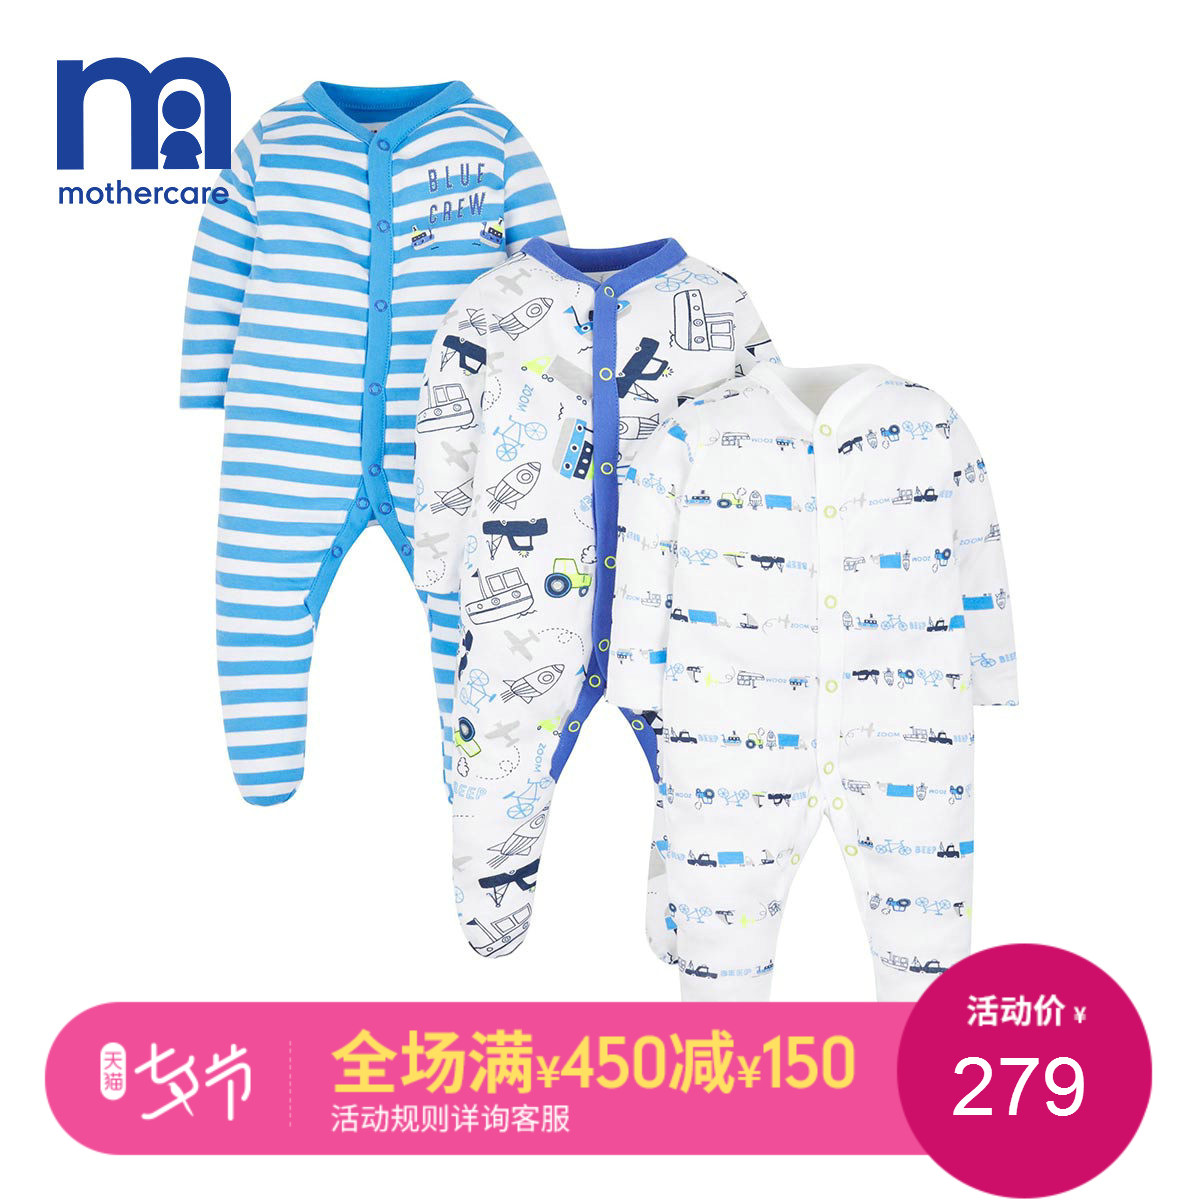 mothercare婴儿夏装男宝宝棉质卡通涂鸦印花包脚新生儿哈衣3件装